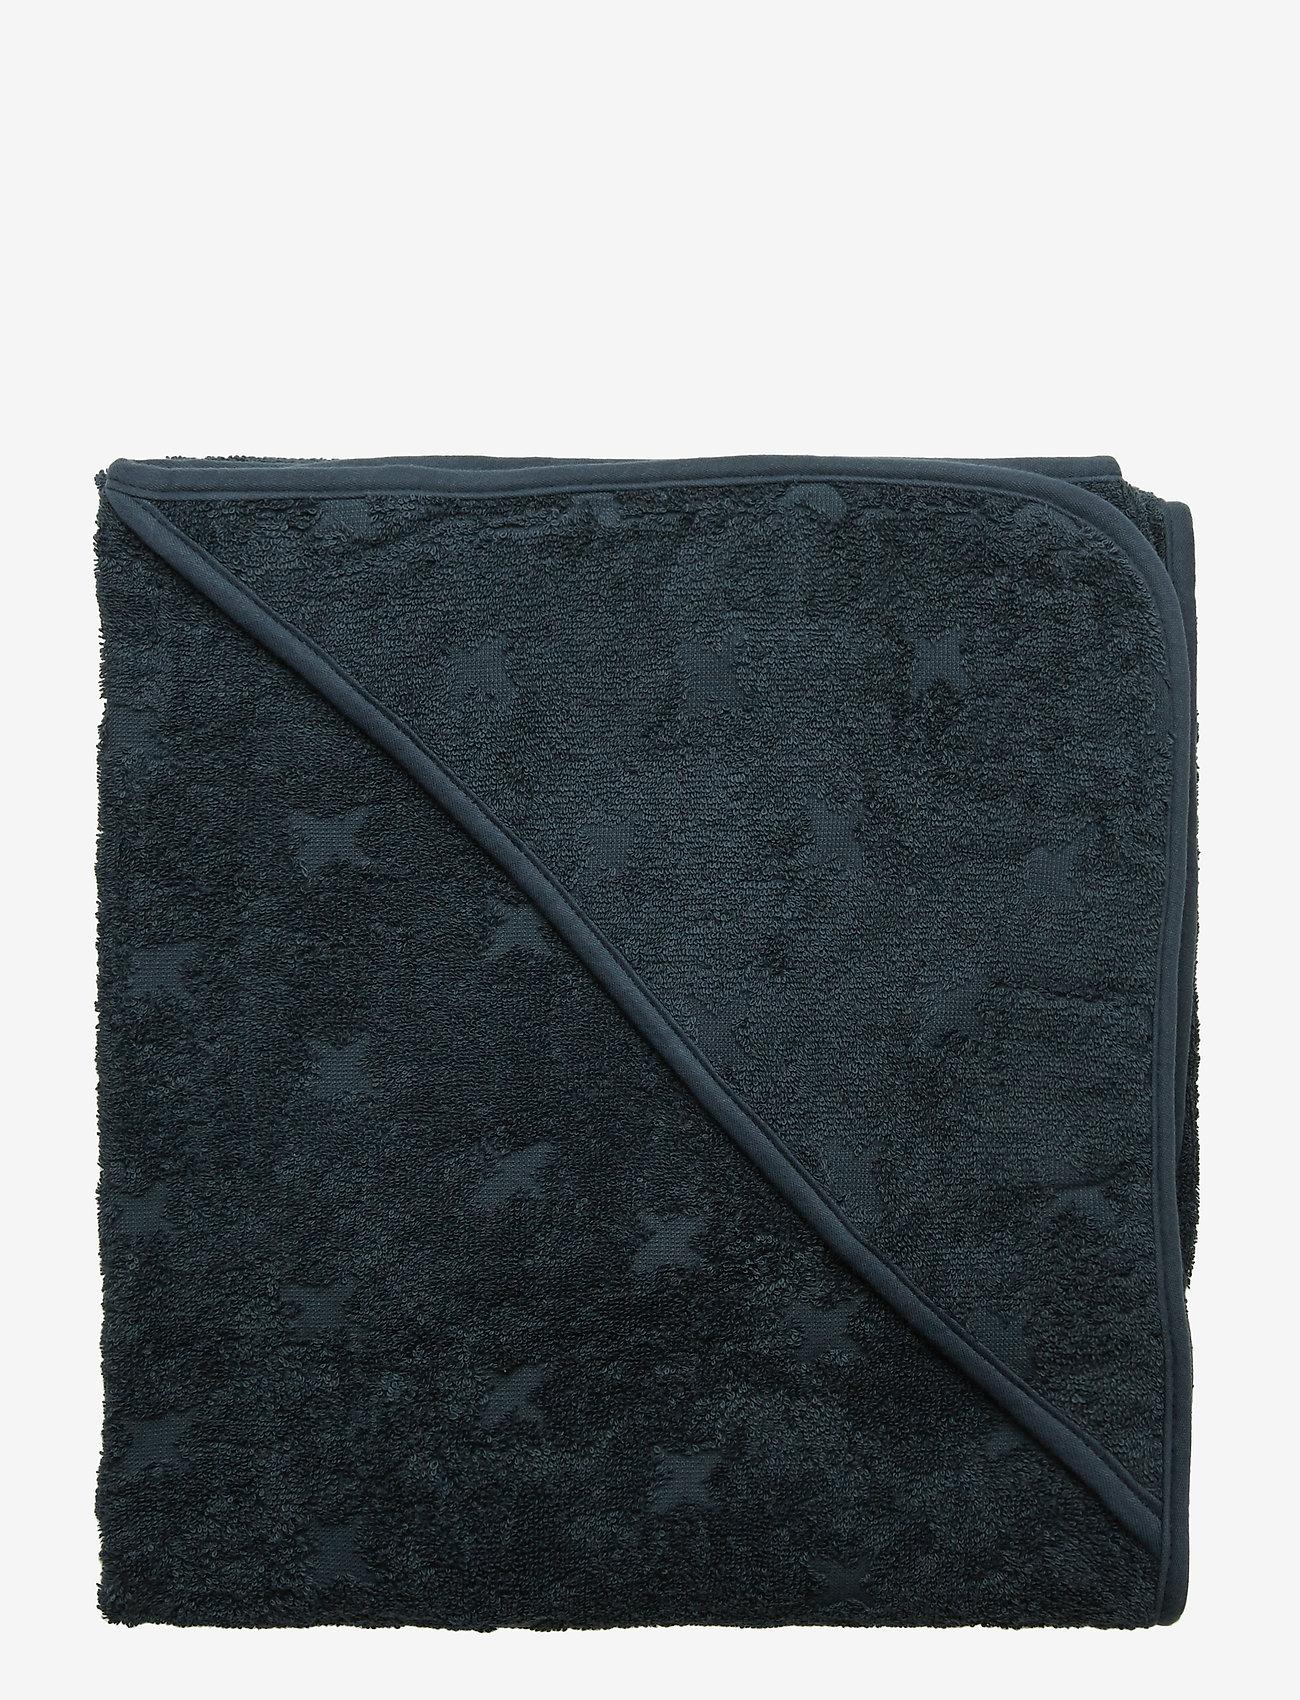 Müsli by Green Cotton - Baby towel - akcesoria - midnight - 0